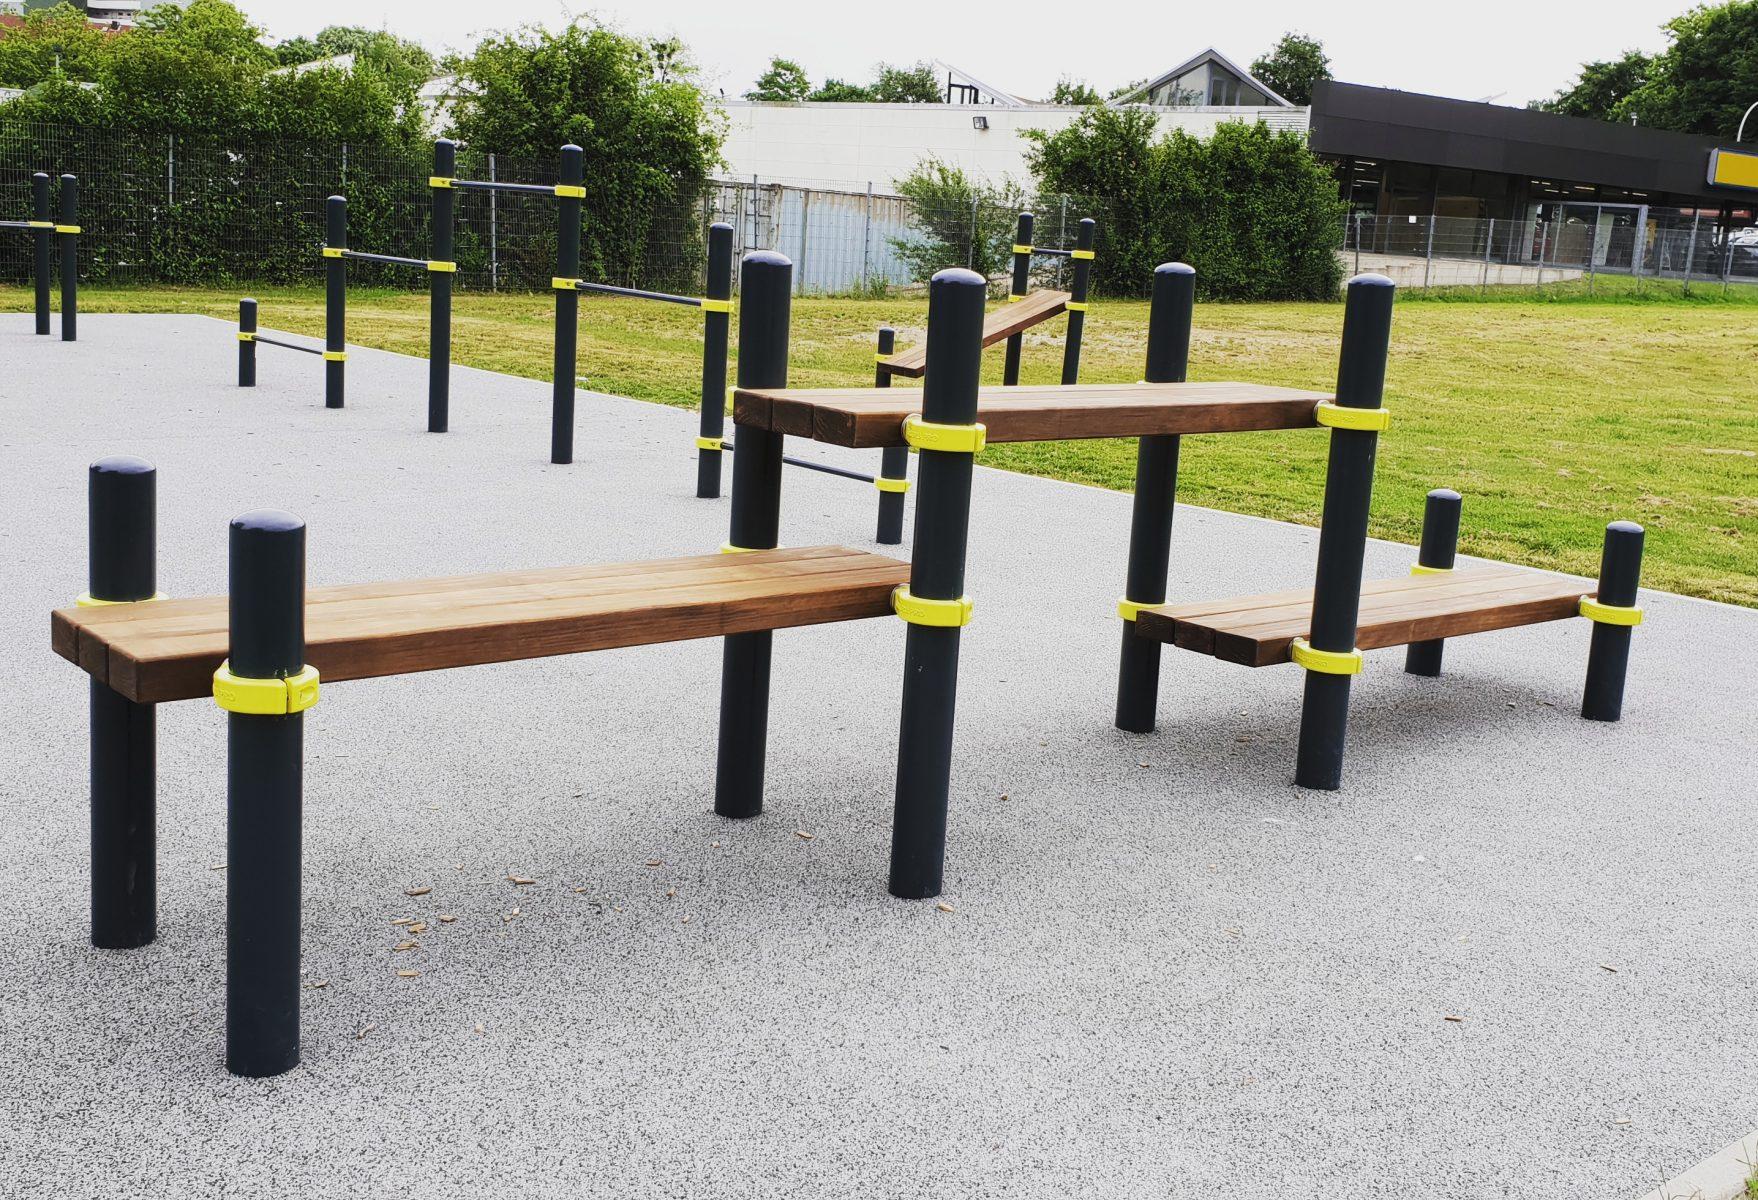 Calisthenics outdoor park in Detmold, Germany - Kenguru Pro Europe